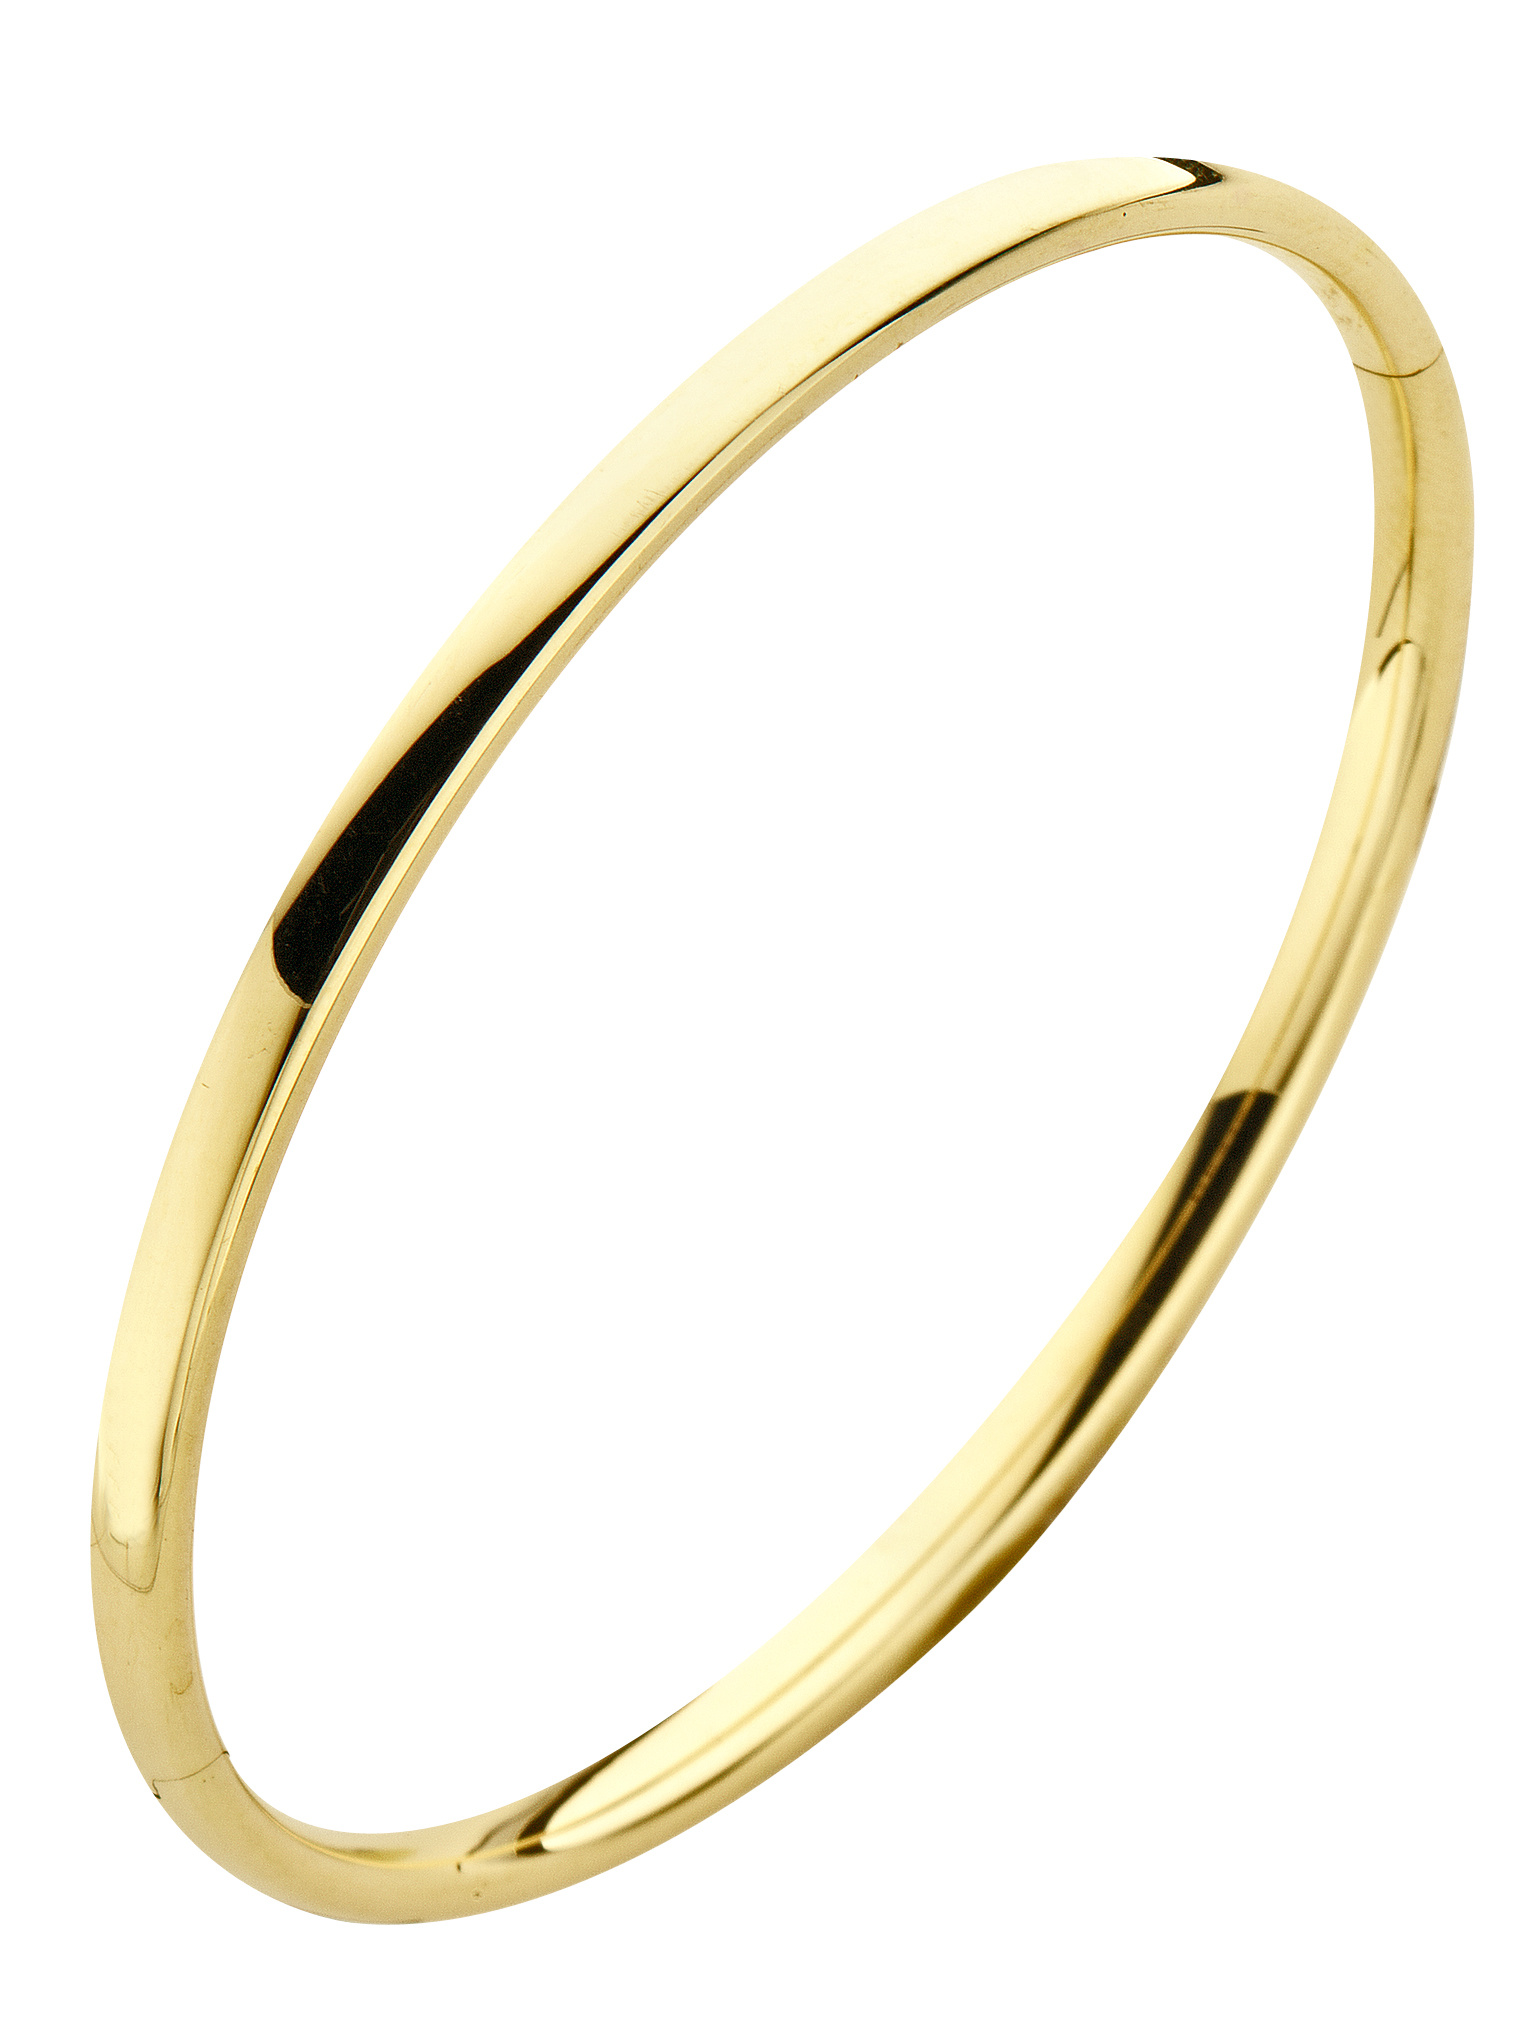 14 karaat geelgouden armband - Ovaal 3 mm - Fjory - Slavenarmband-2